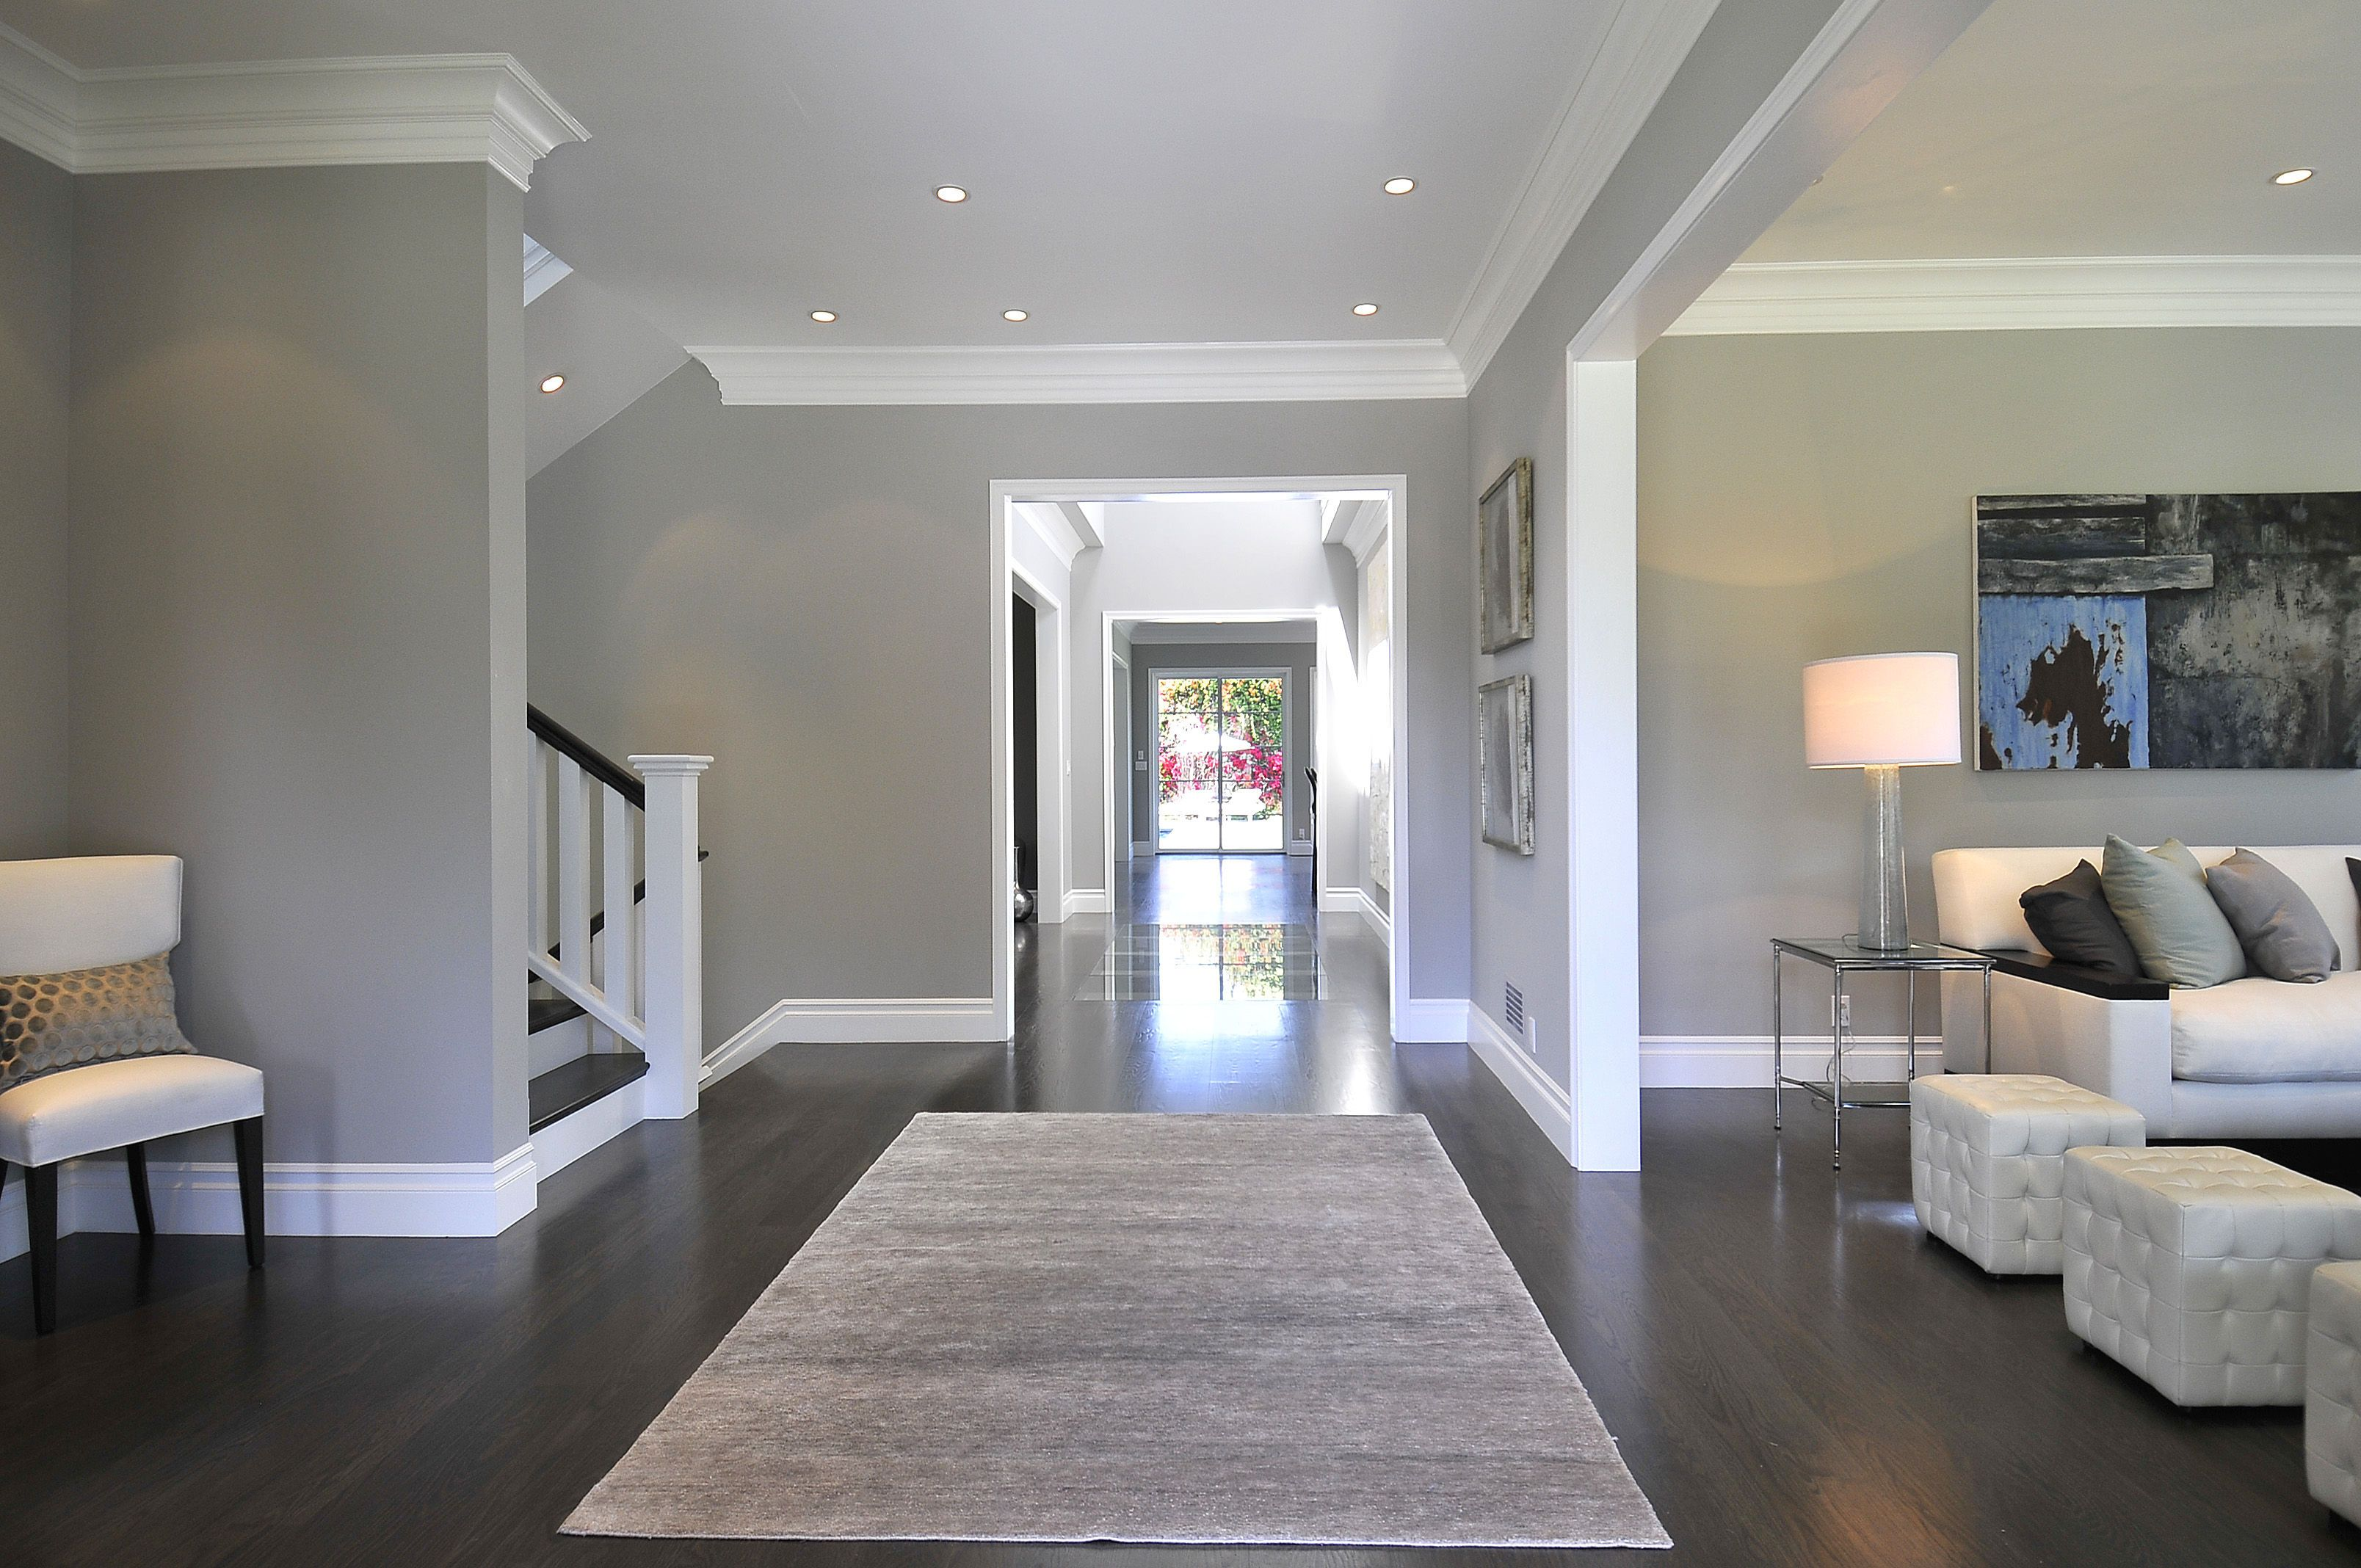 gray walls with dark wood floors